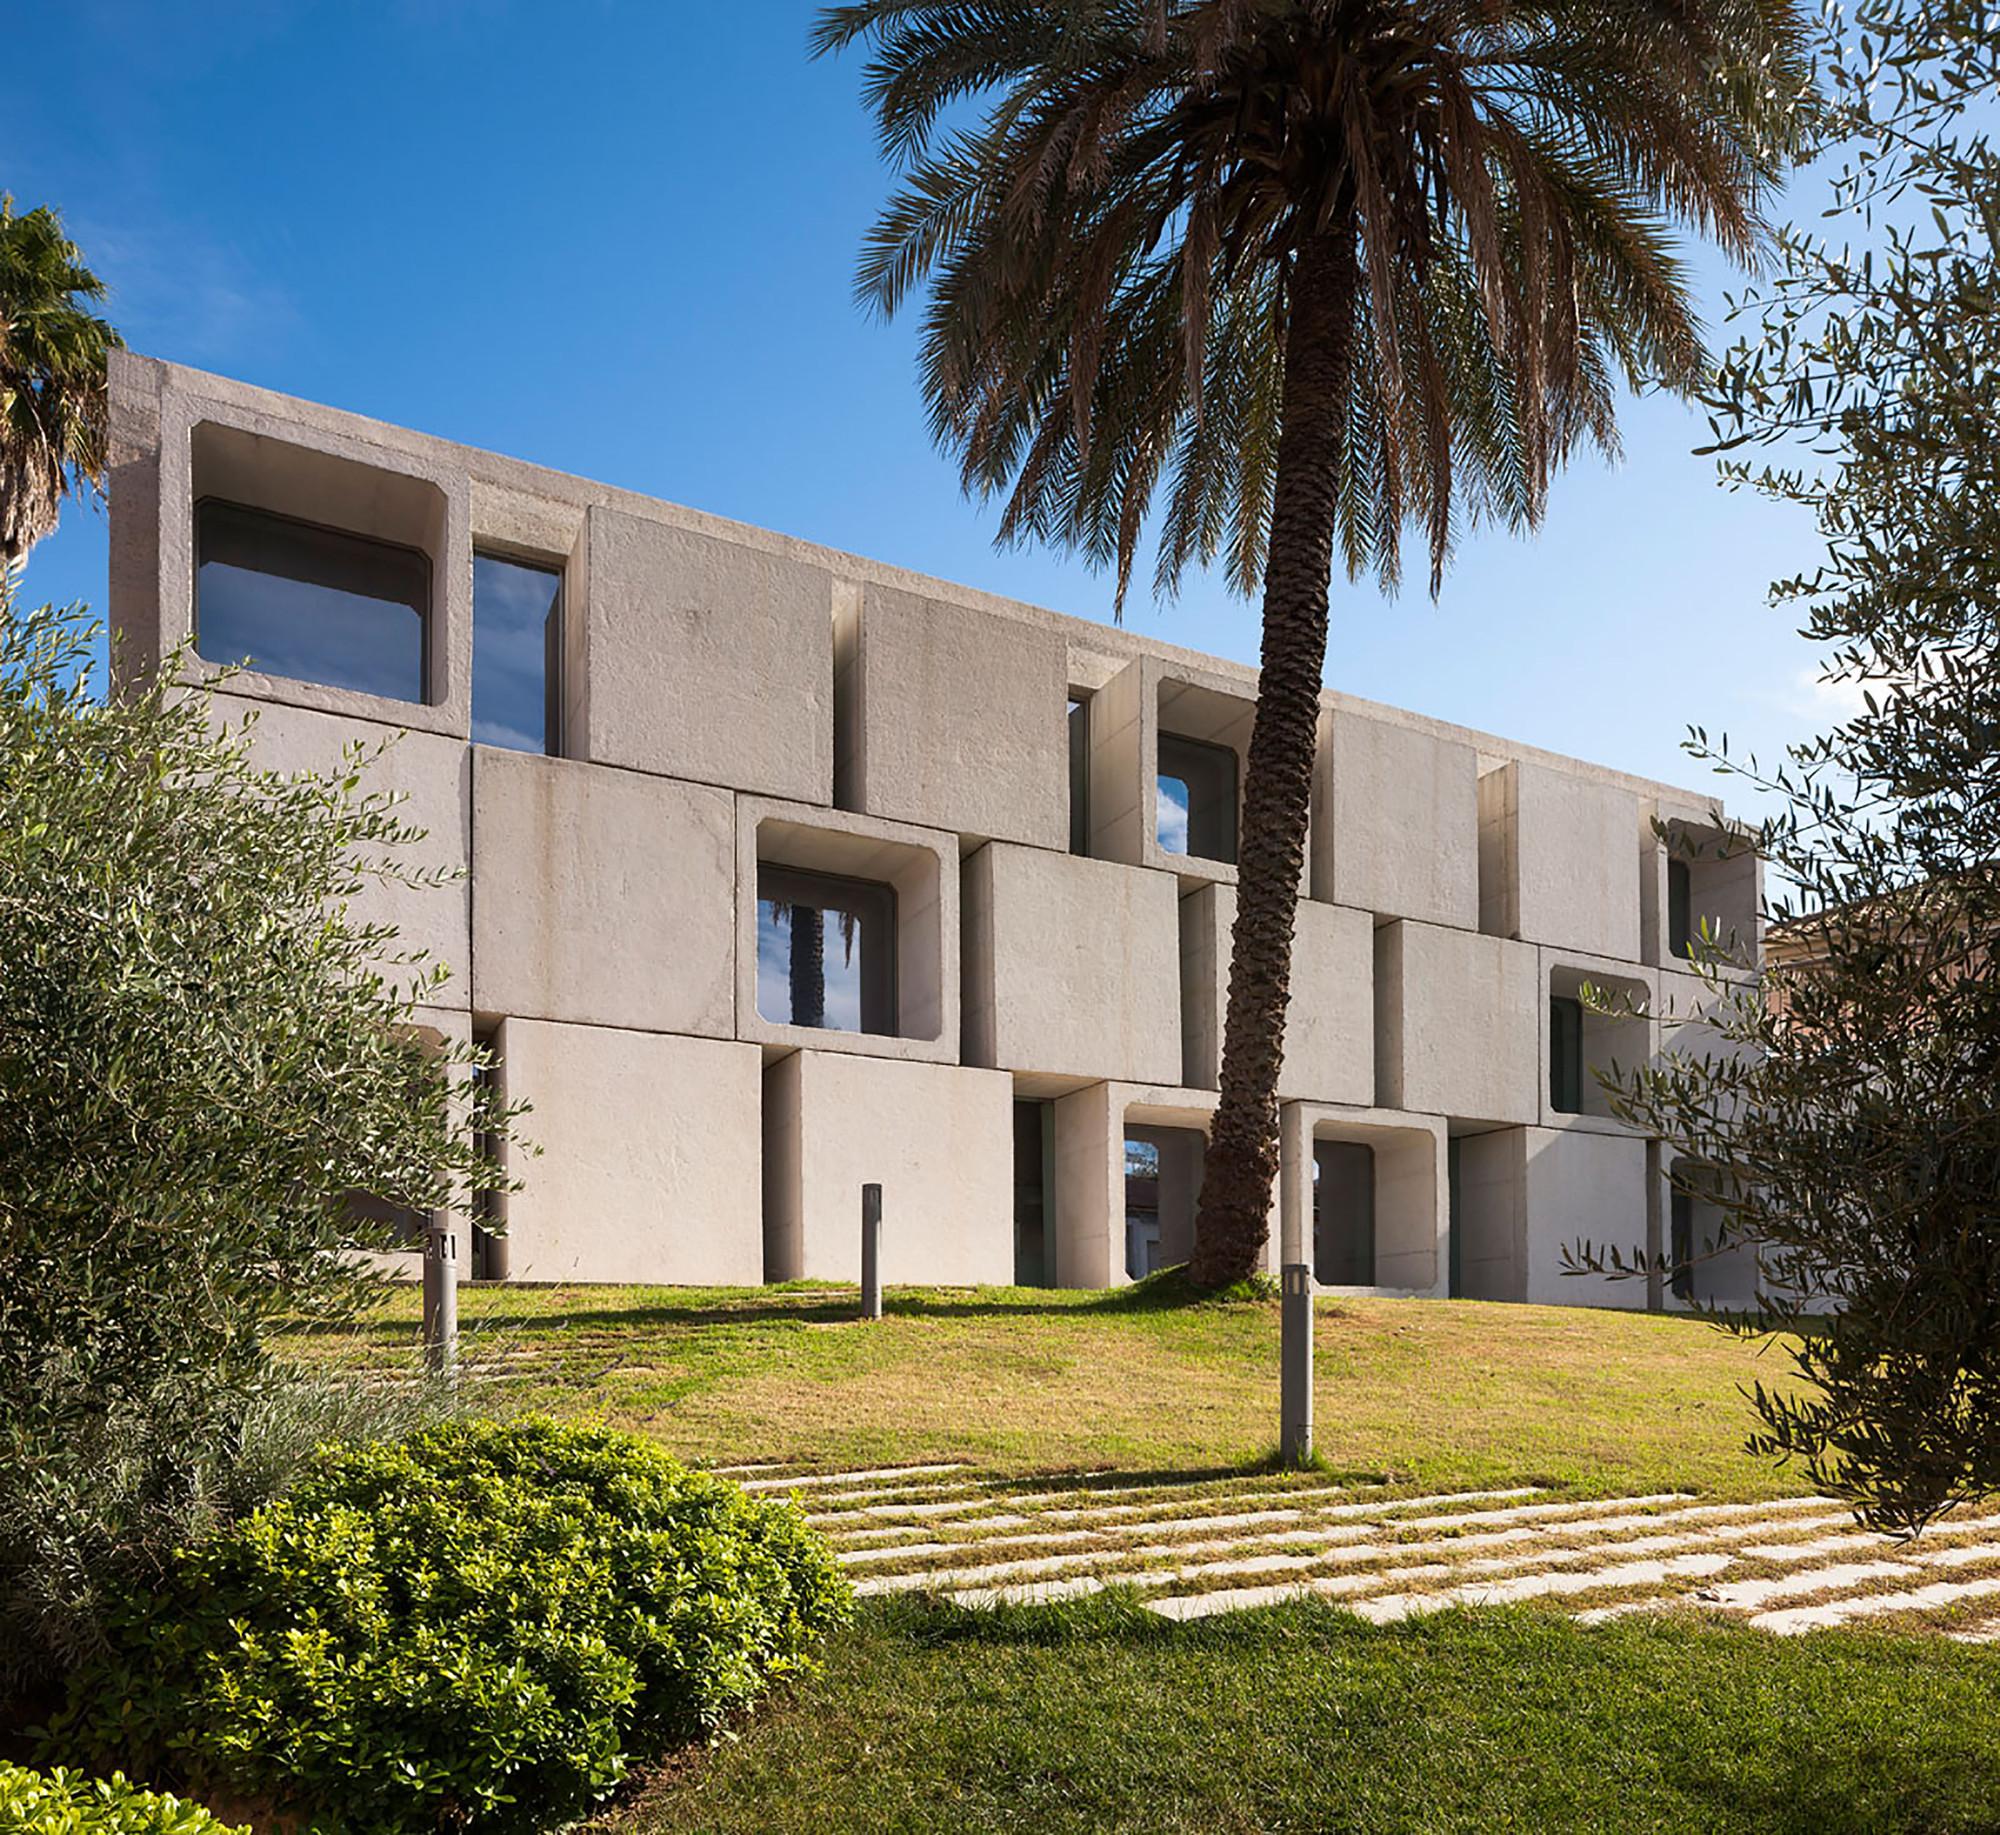 Biblioteca Antonio Gala  / Francisco López  + Gudula Rudolf, © Fernando Alda